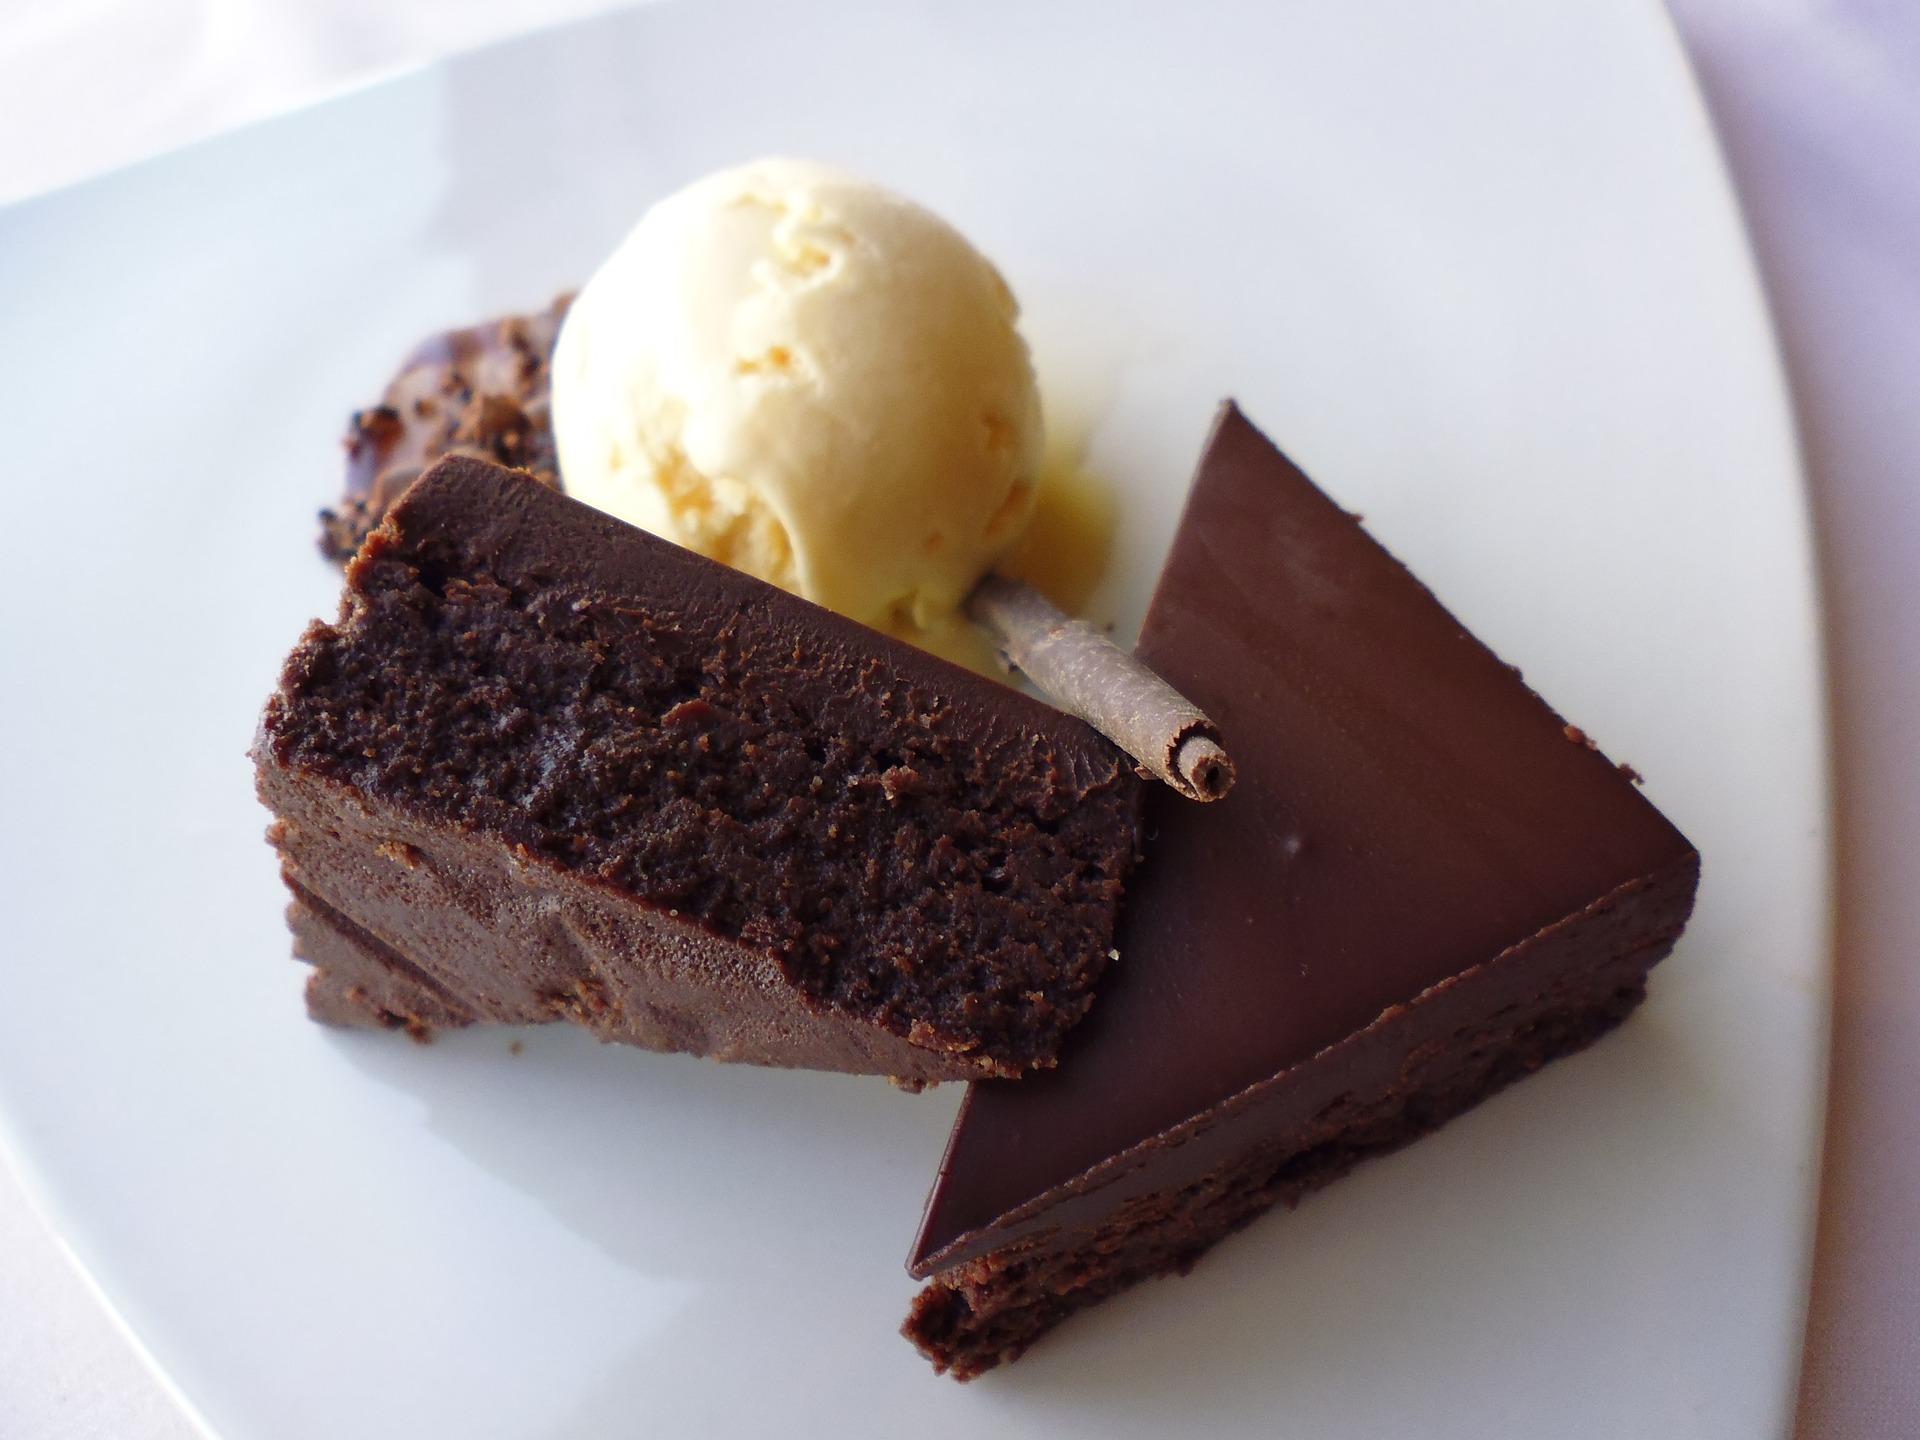 cake and ice cream pixabay